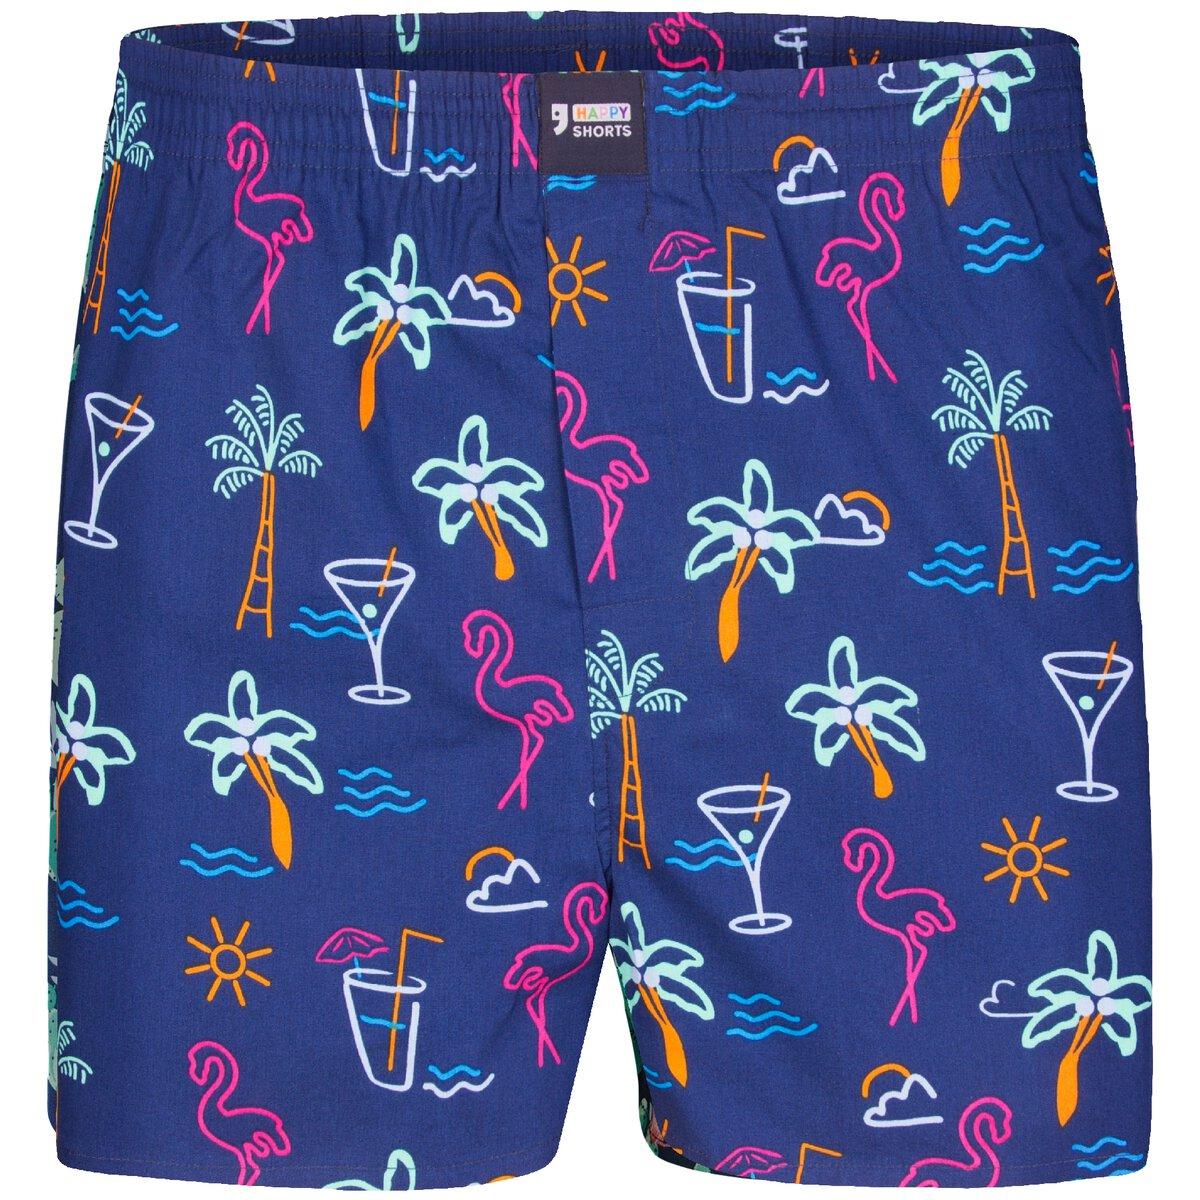 Happy Shorts Boxershorts Cocktail, 9,70 €